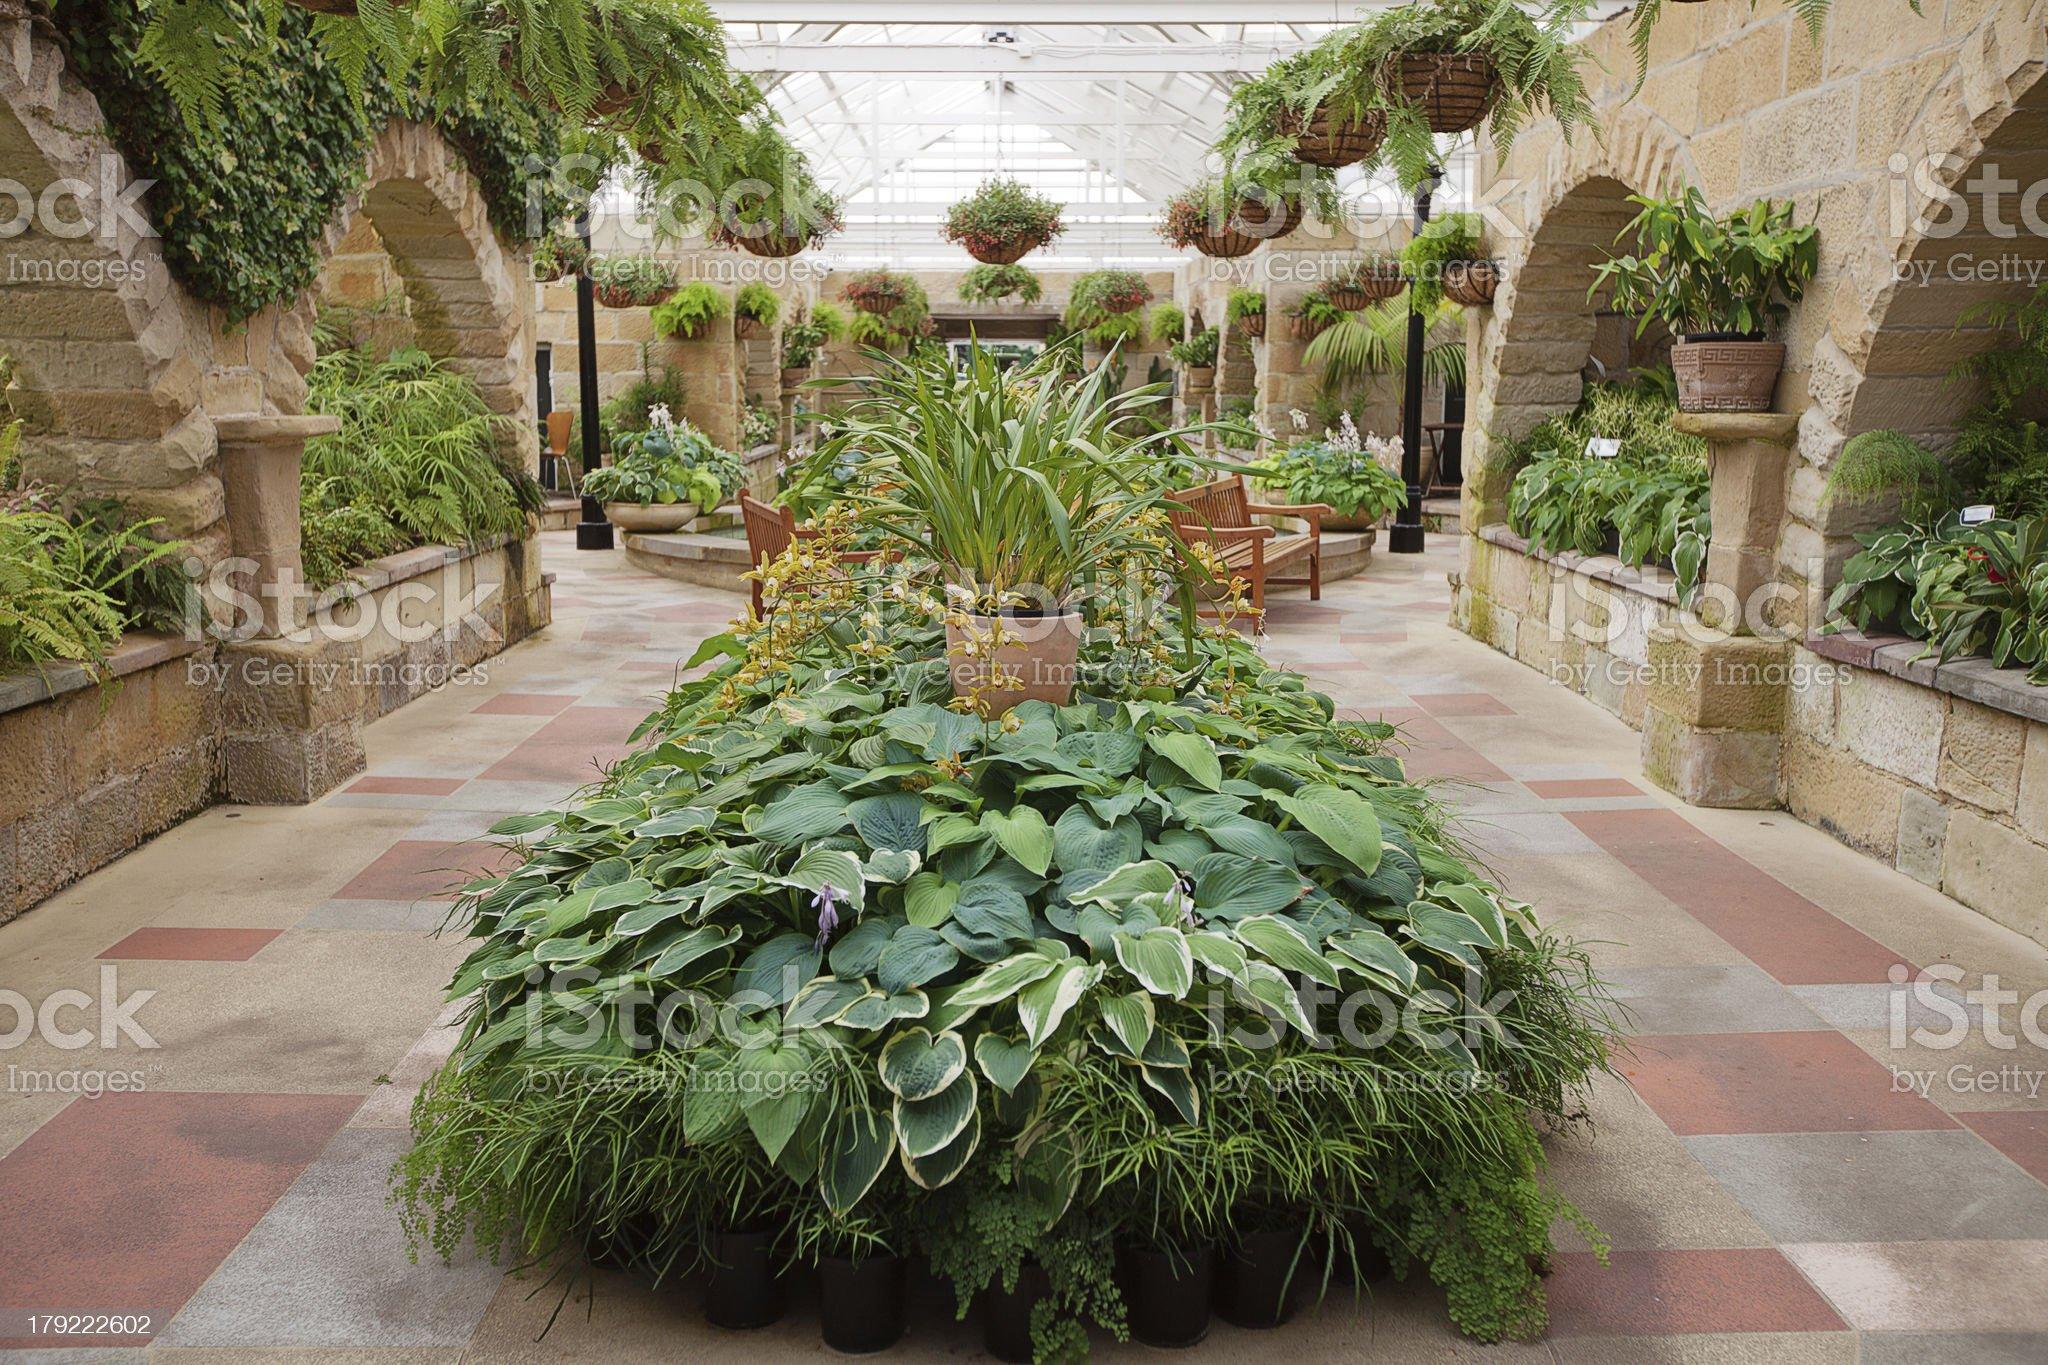 Garden Conservatory royalty-free stock photo